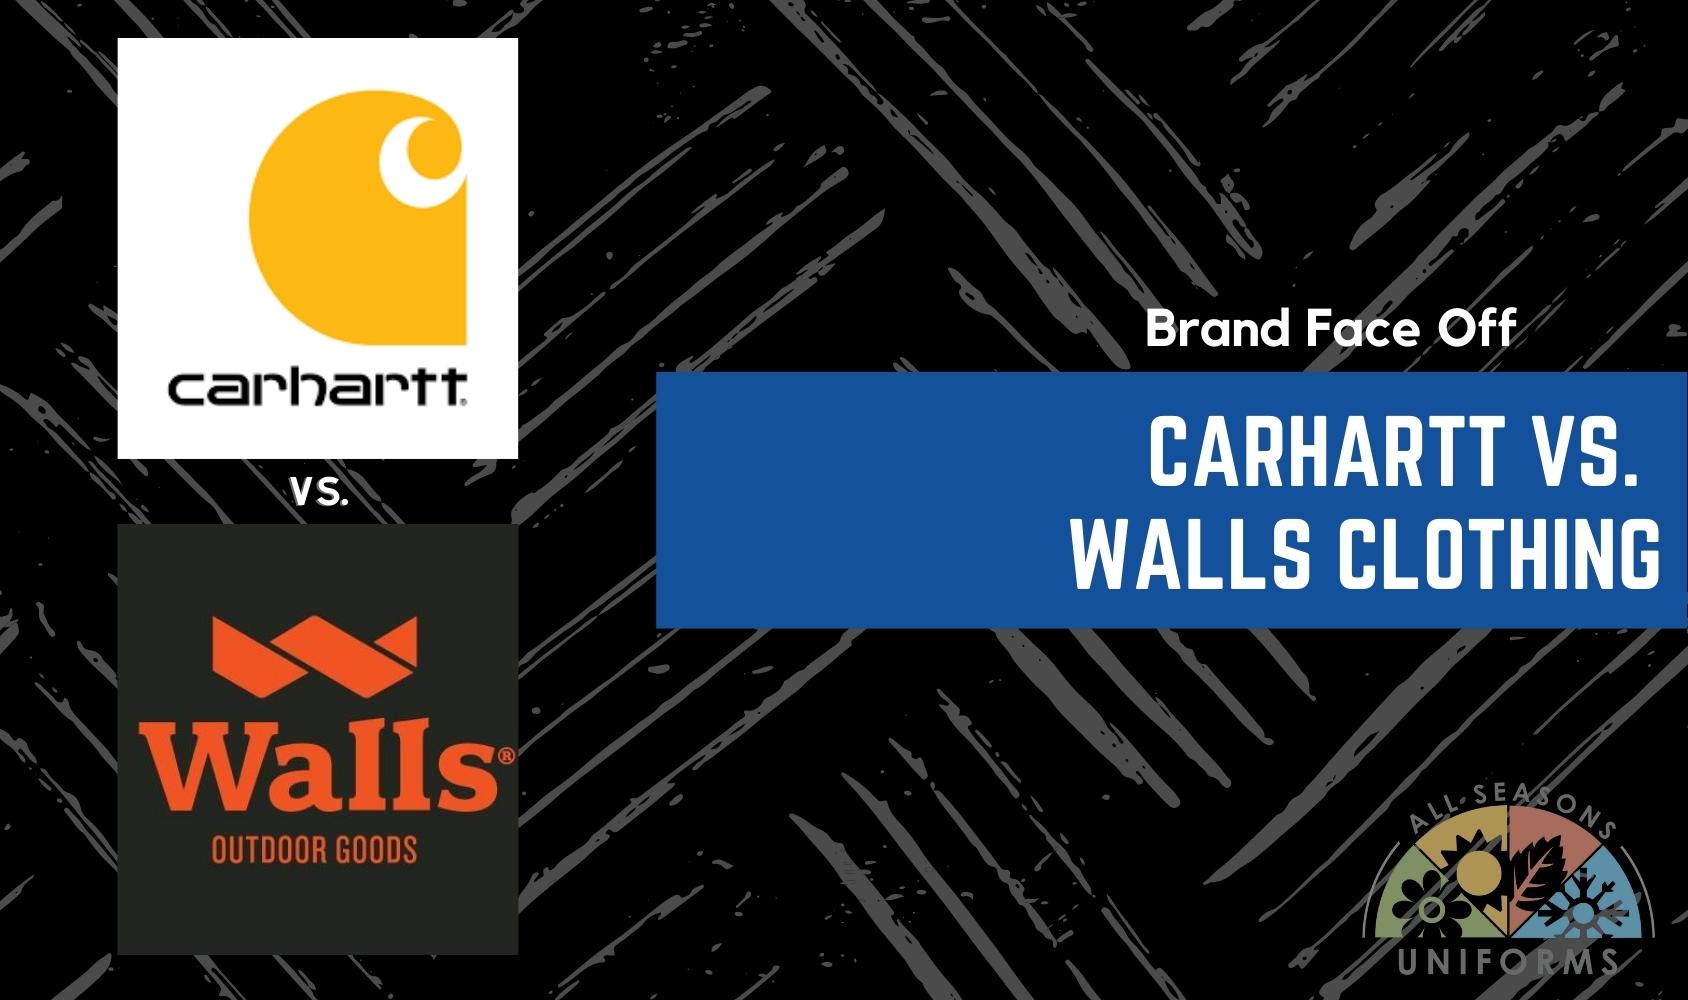 Brand Face Off –Carhartt vs. Walls Clothing